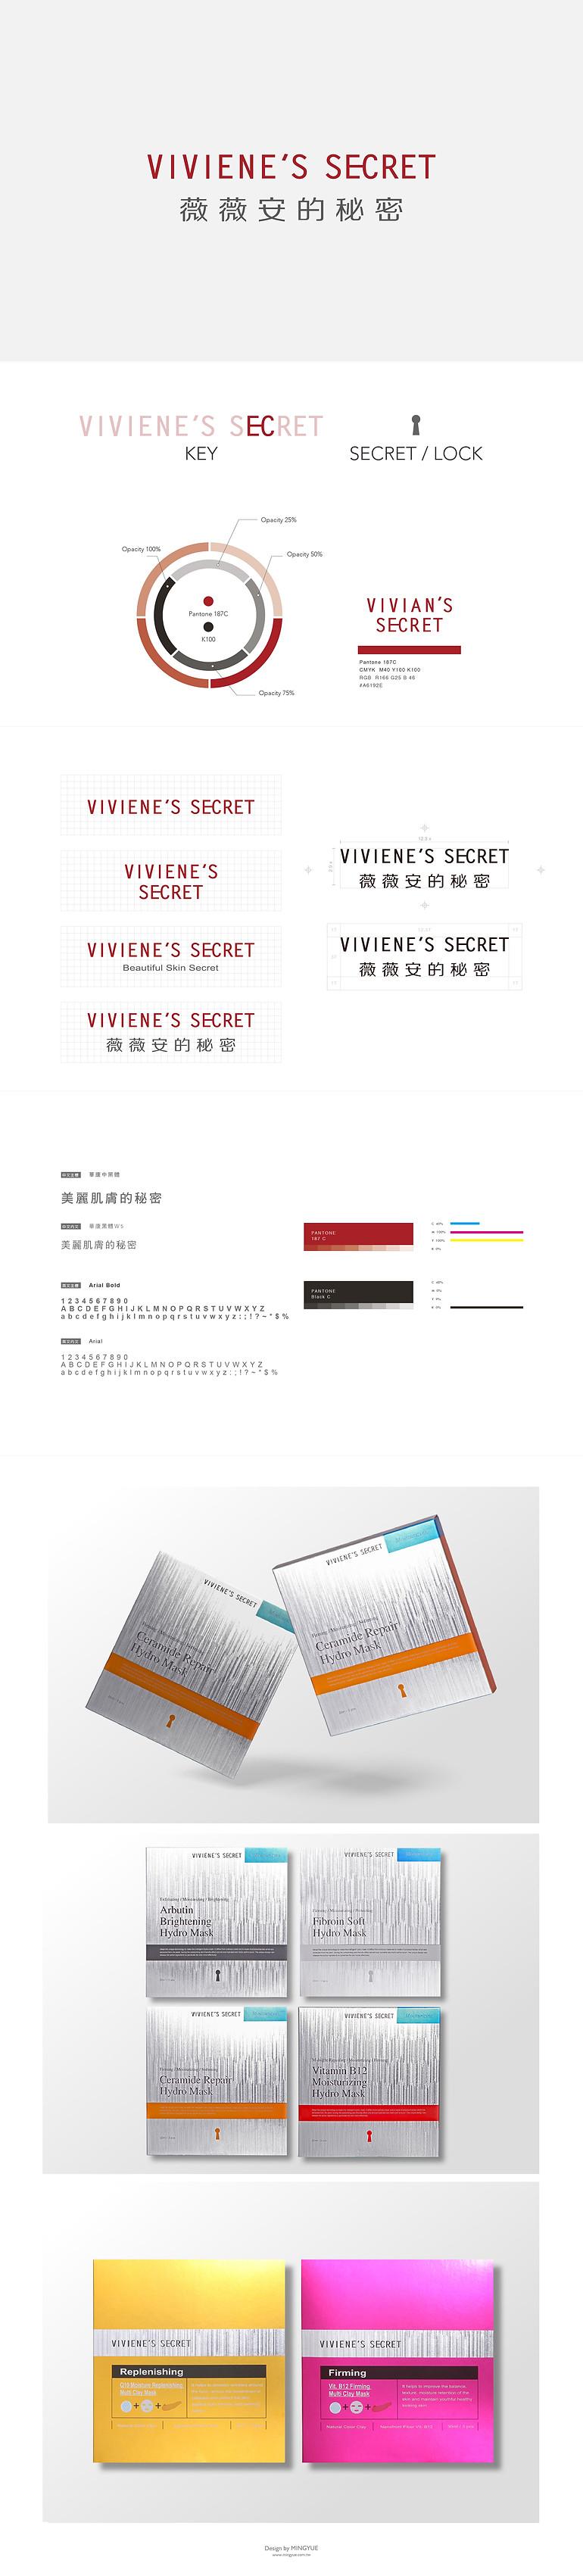 vivians secrect-簡易CI-0922_品牌設計.jpg